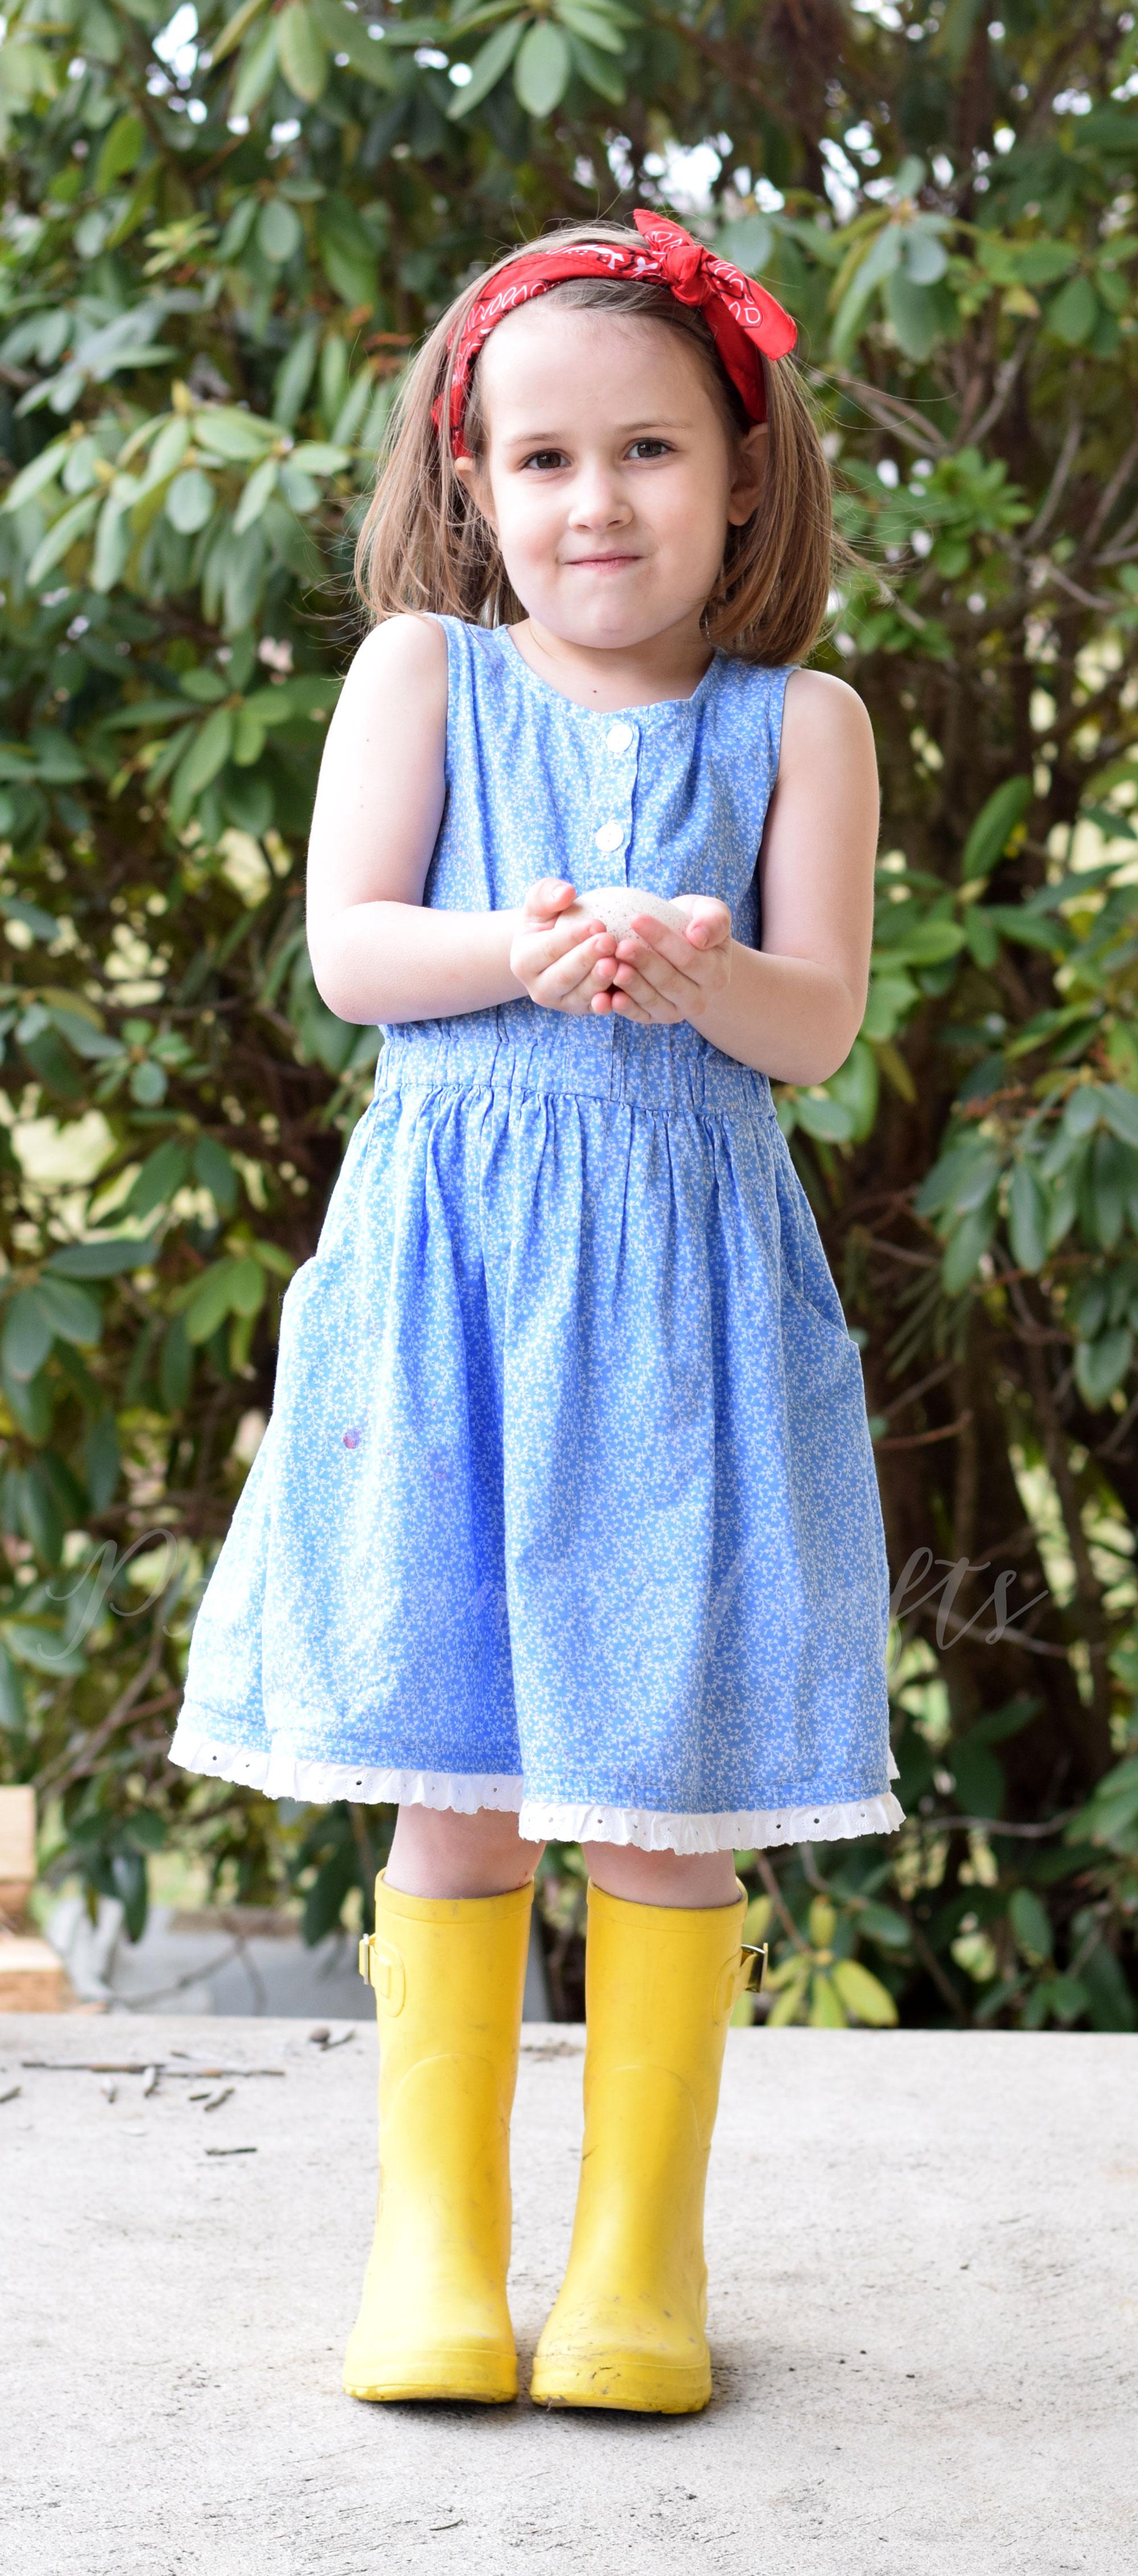 The Farmer Dress